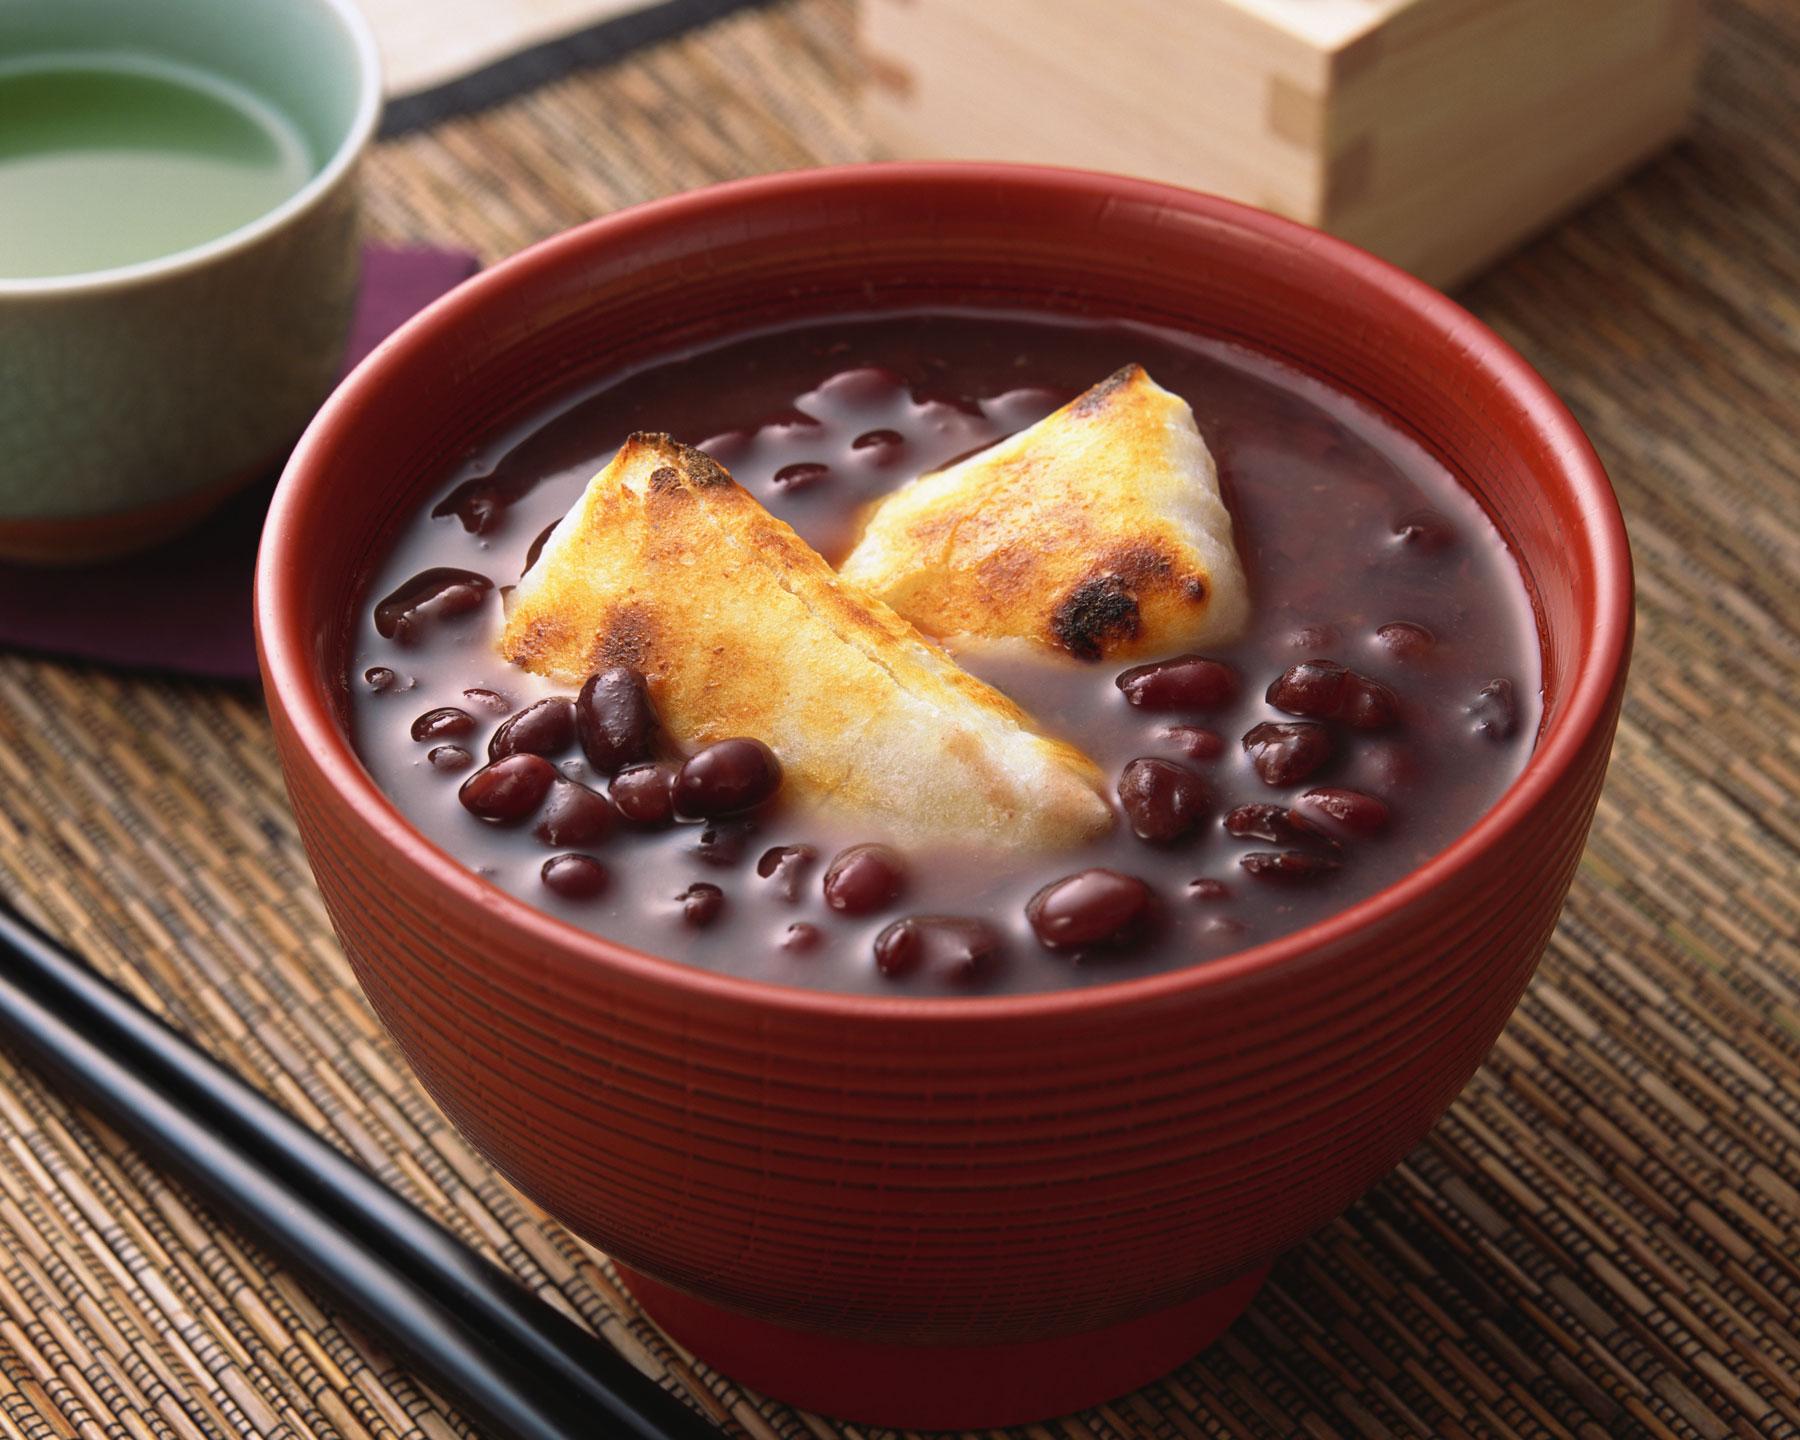 A sweet red bean soup in a dark orange bowl.